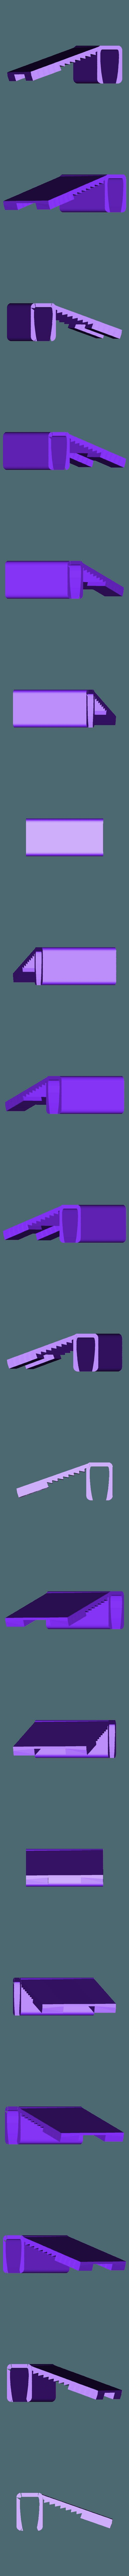 st10_support_minuteur.stl Download free STL file ST10+ support de minuteur sur blade chroma • 3D print template, Cyborg